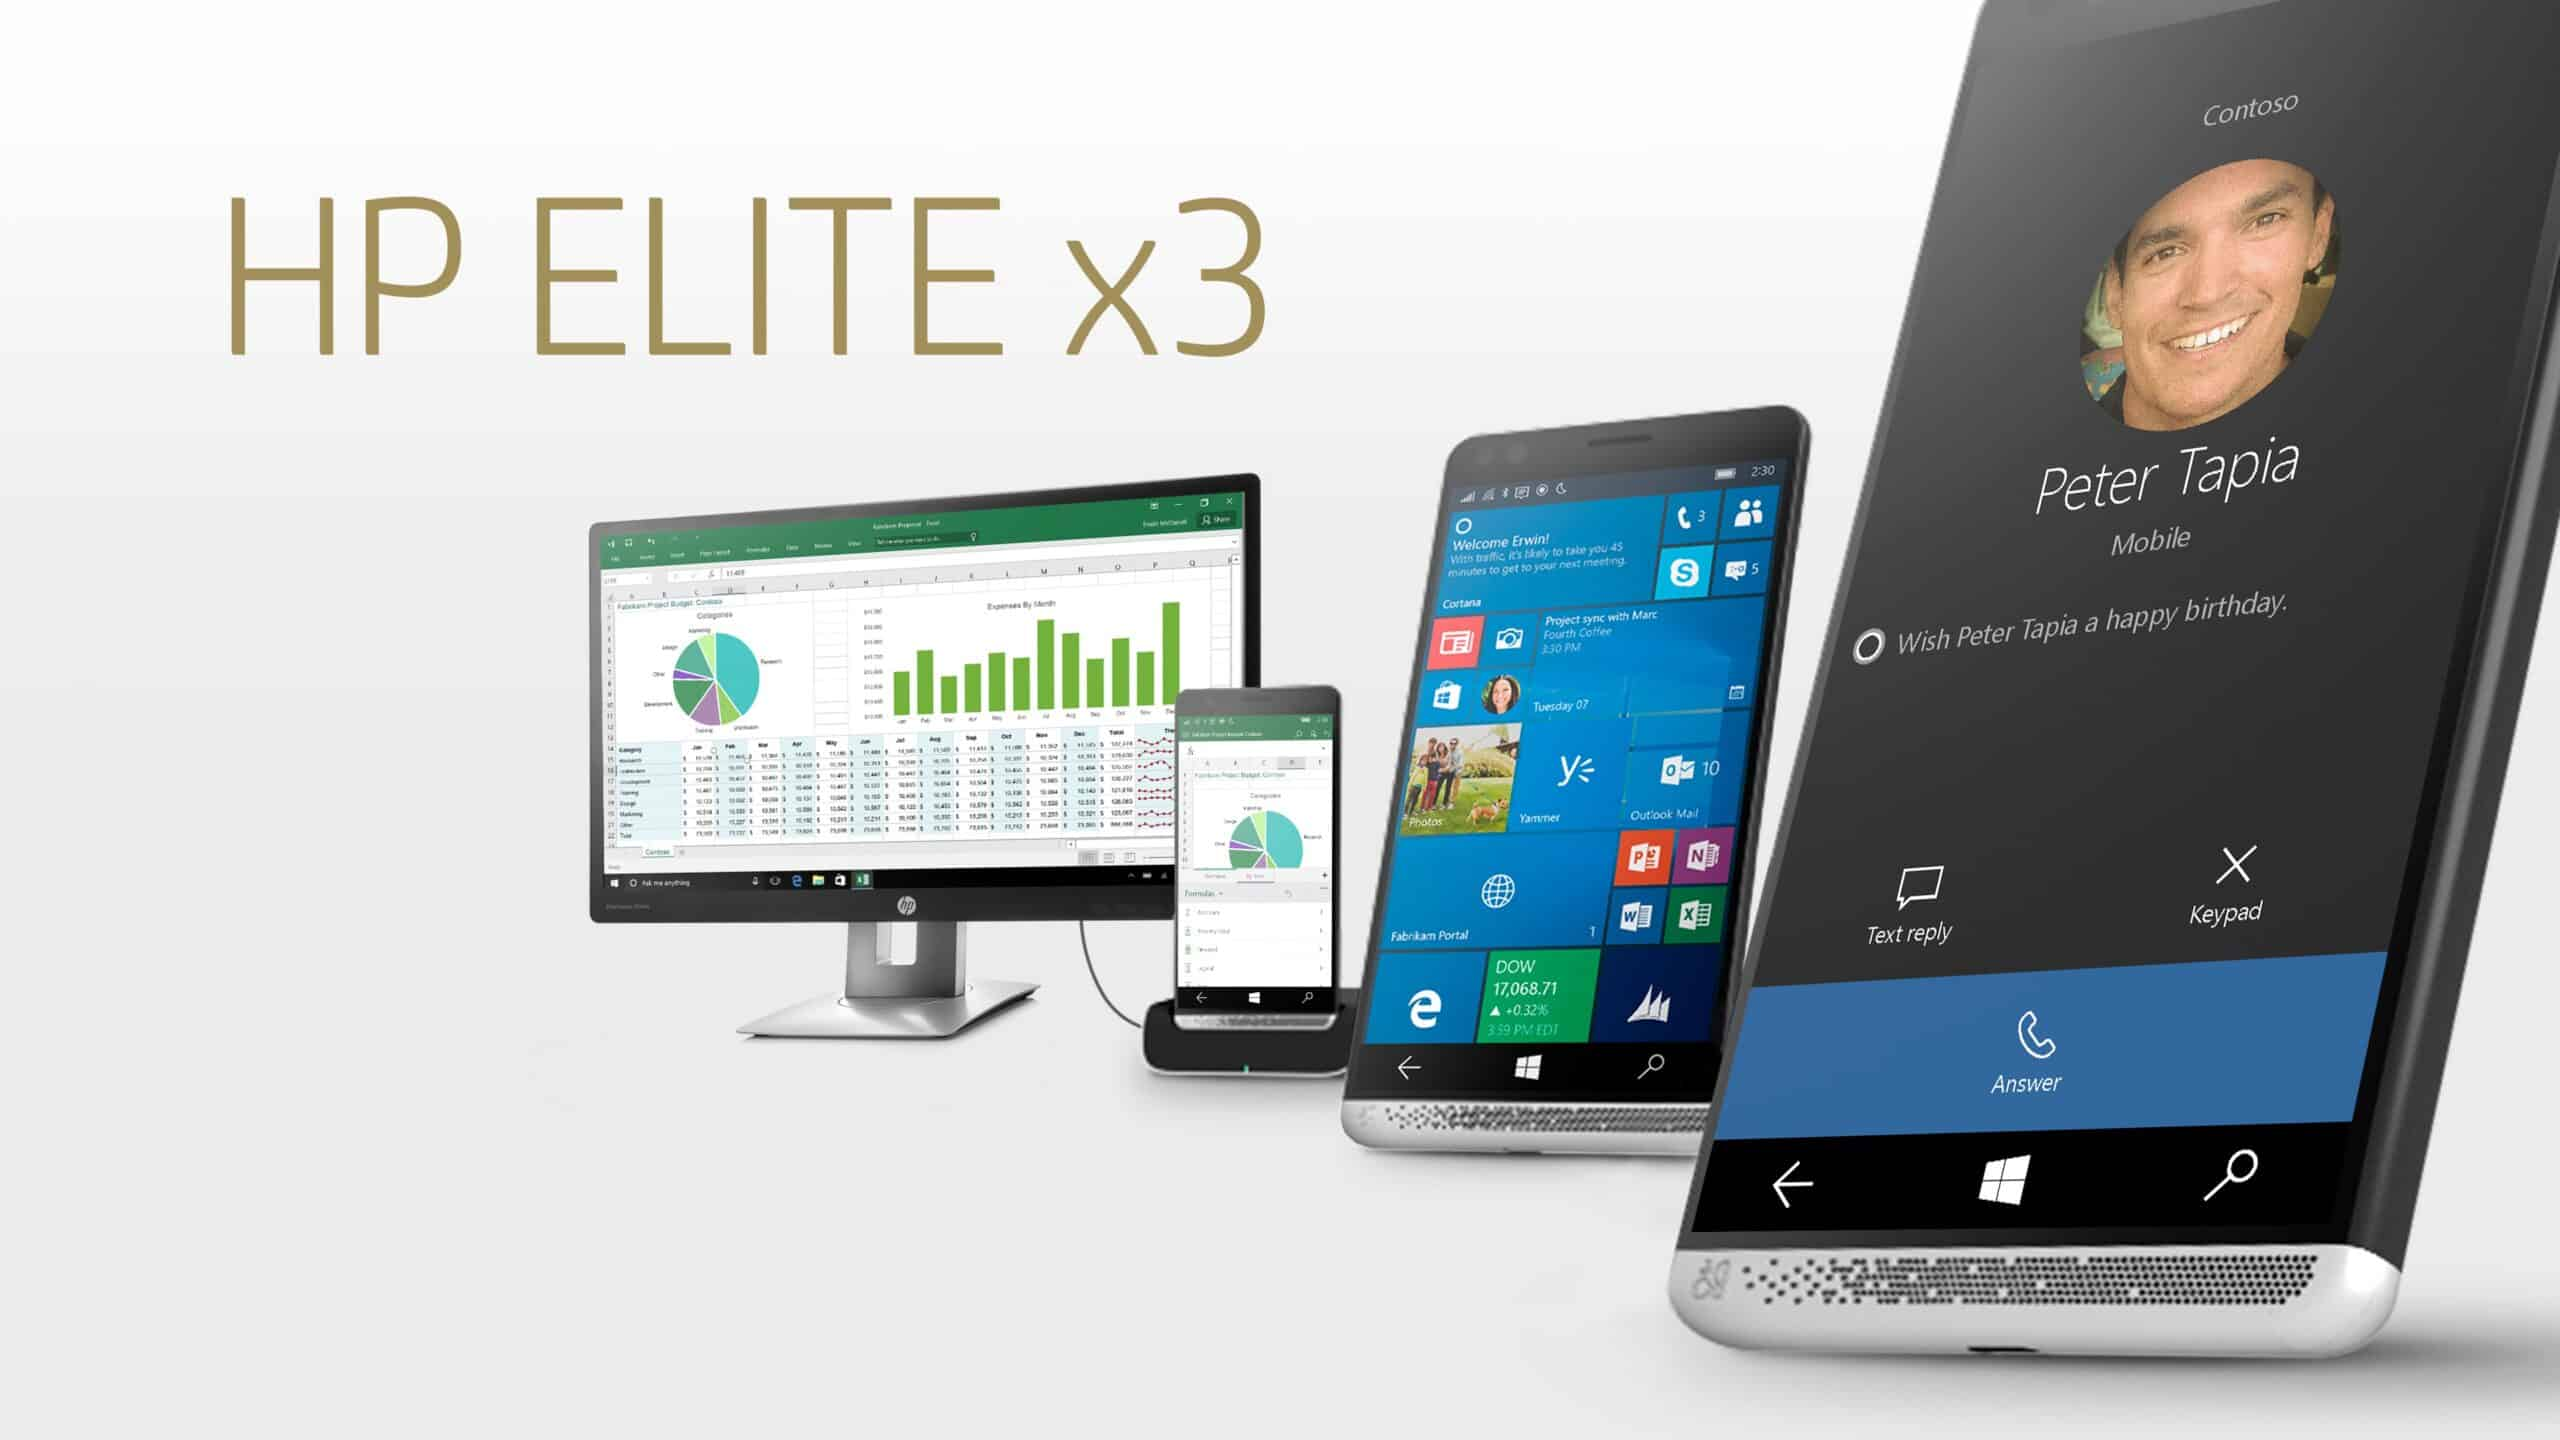 HP-Elite-x3 HP Elite x3 أفضل هاتف ويندوز 10 للأعمال ومنافس لبلاك بيري برايف